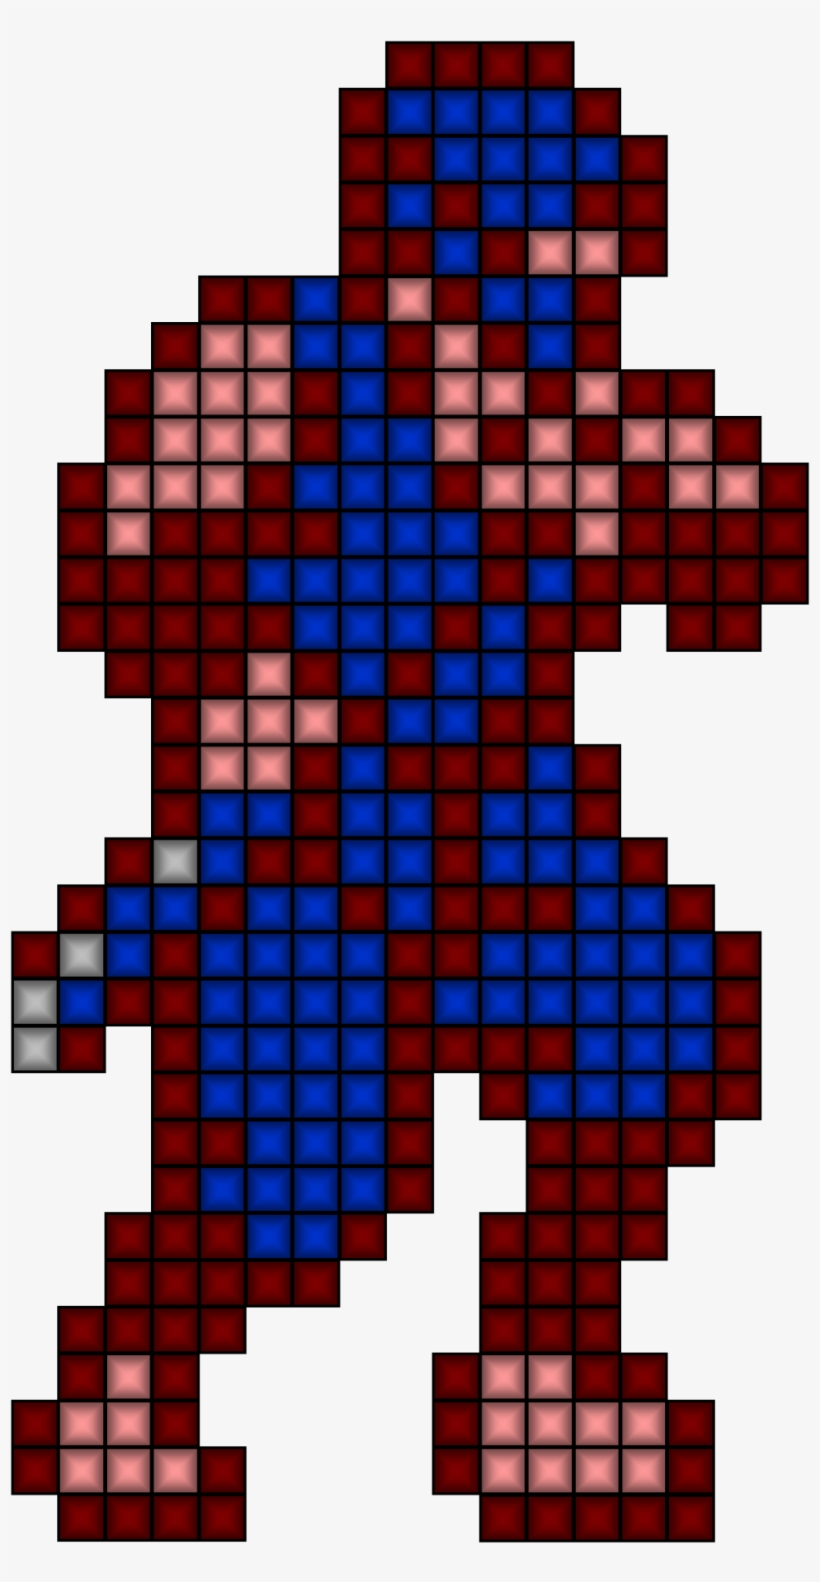 """ Ryu Hayabusa "" - Ryu Hayabusa Pixel Art, transparent png #3114803"